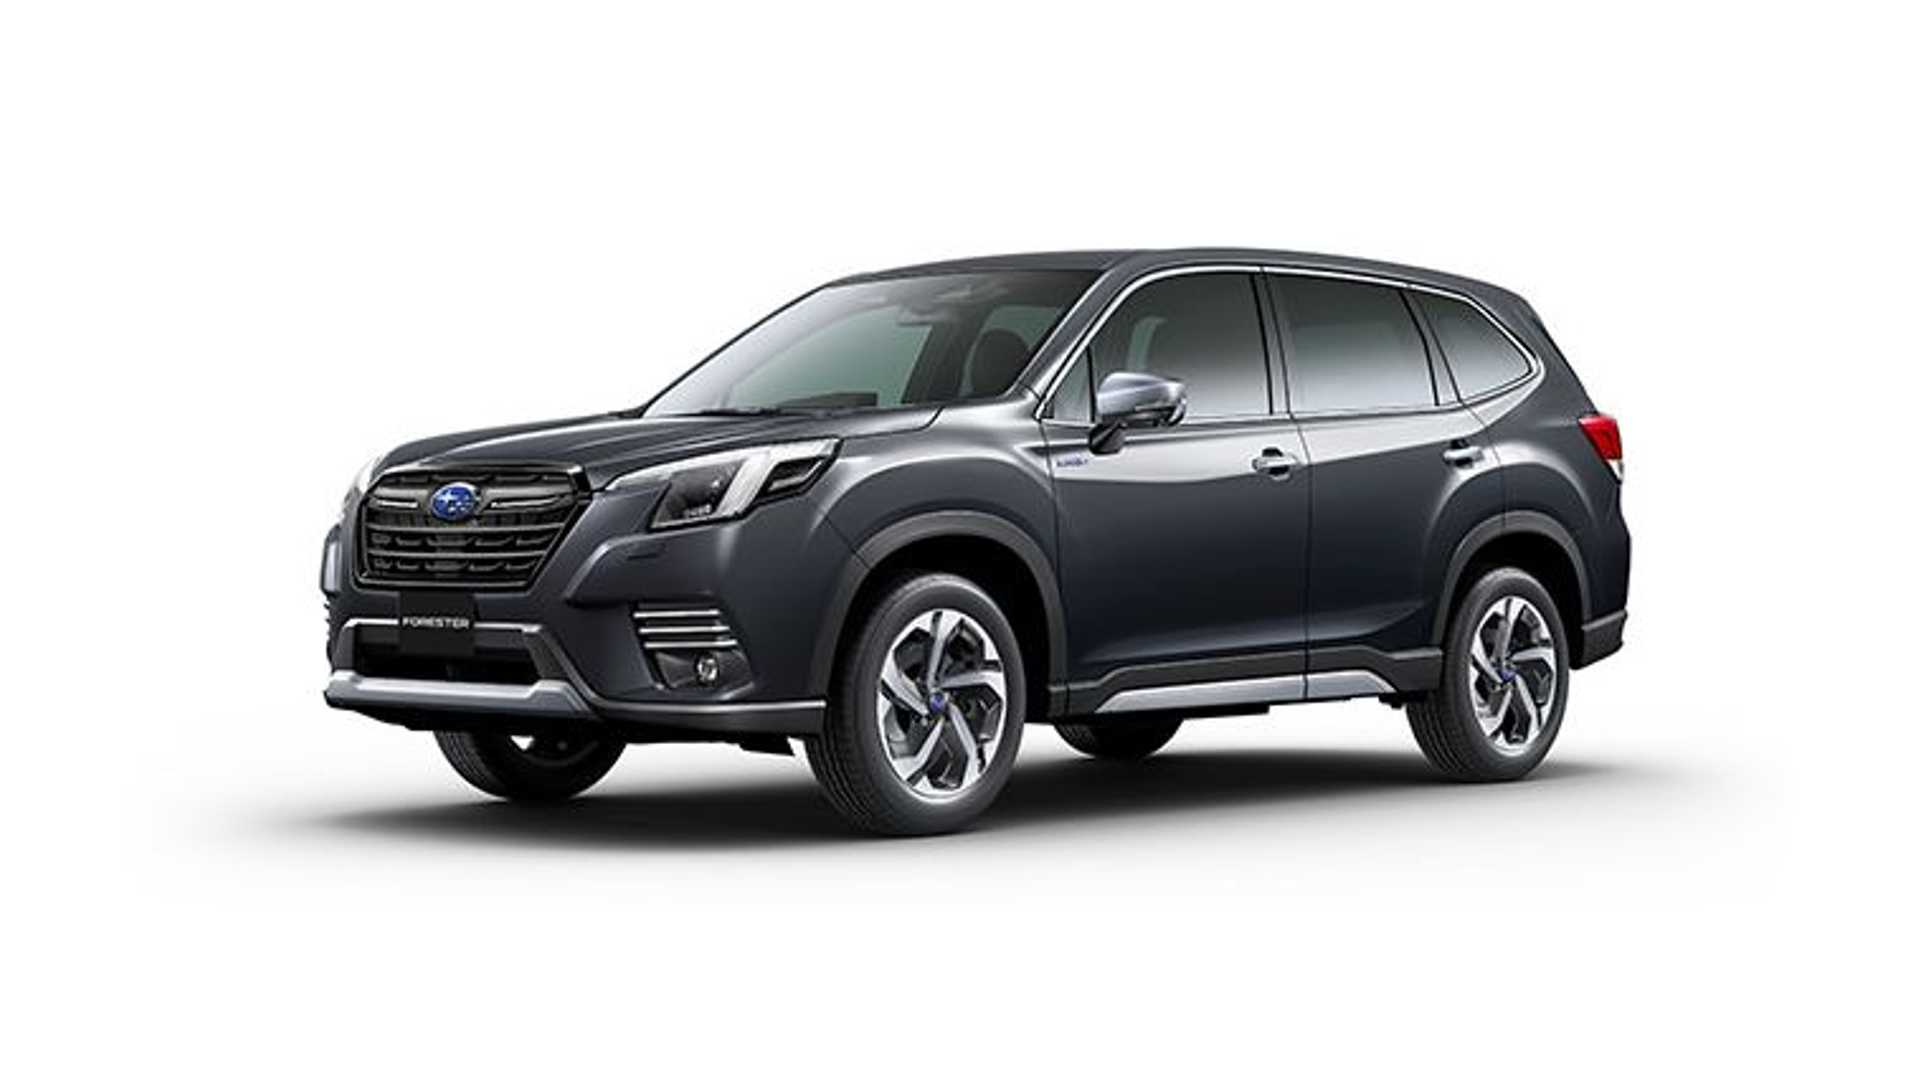 Subaru-Forester-facelift-17